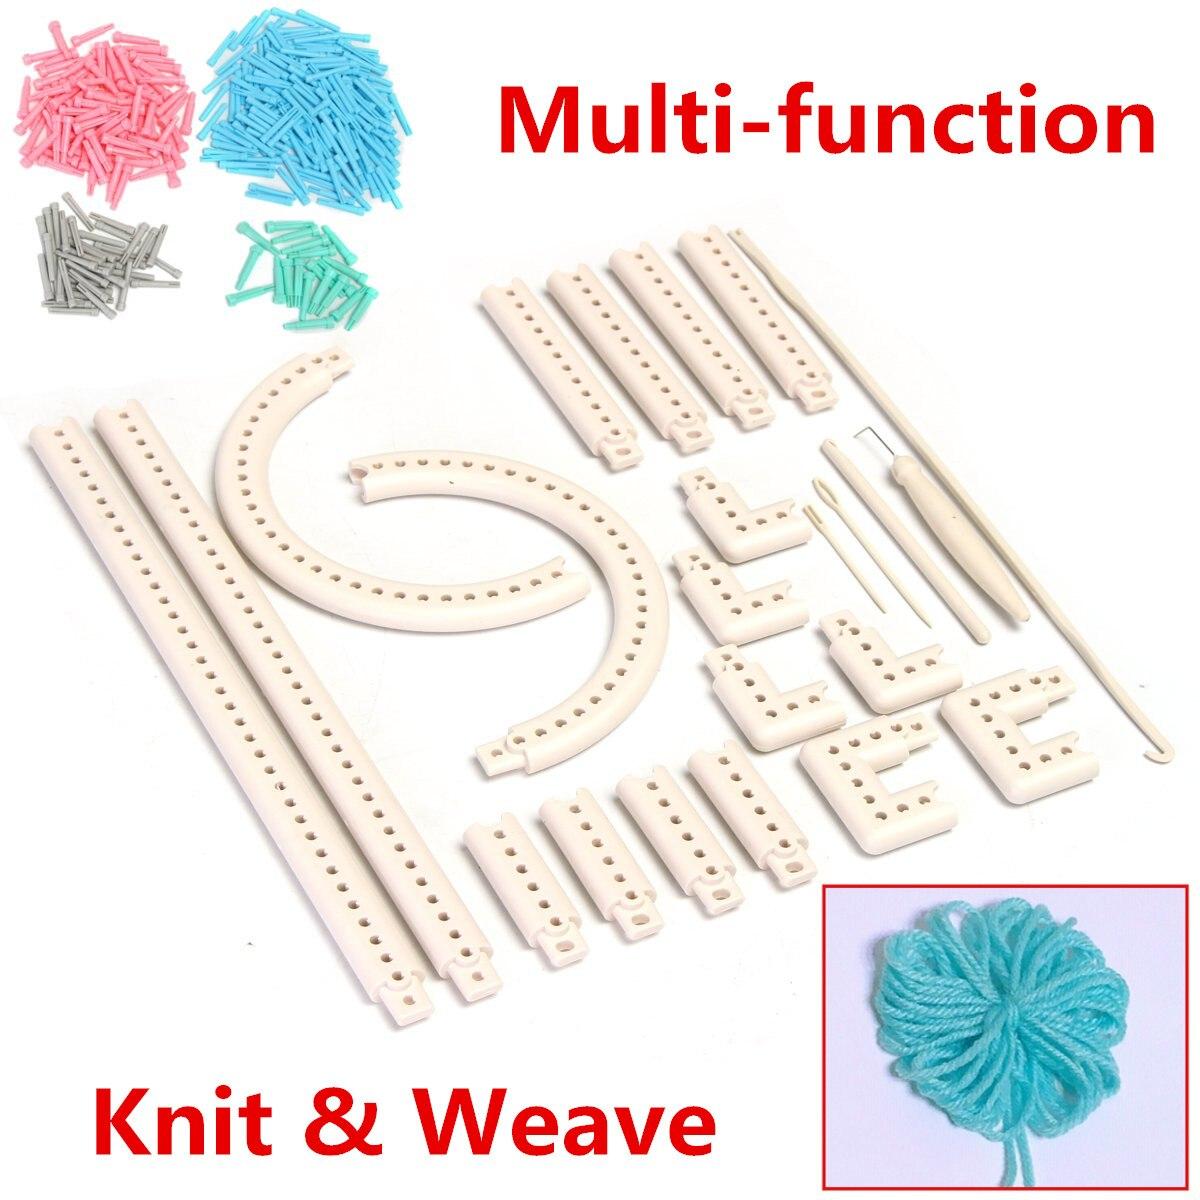 Multi-function Knitting Board Knit&Weave Loom Craft Yarn Kit DIY Scarf Sweater